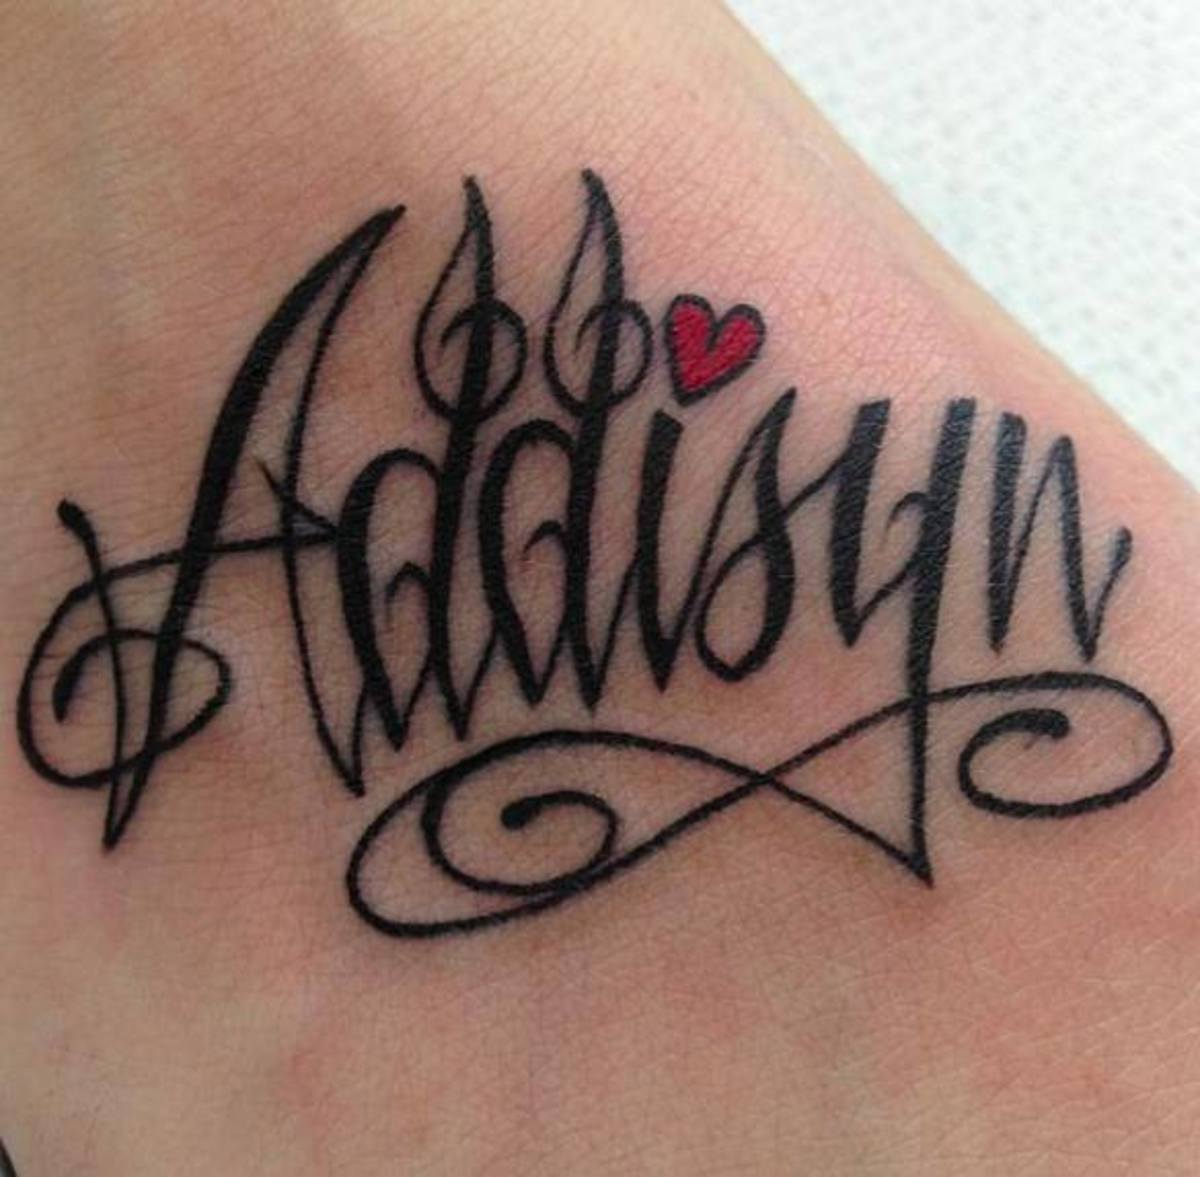 Gothic adaptation scripting tattoo